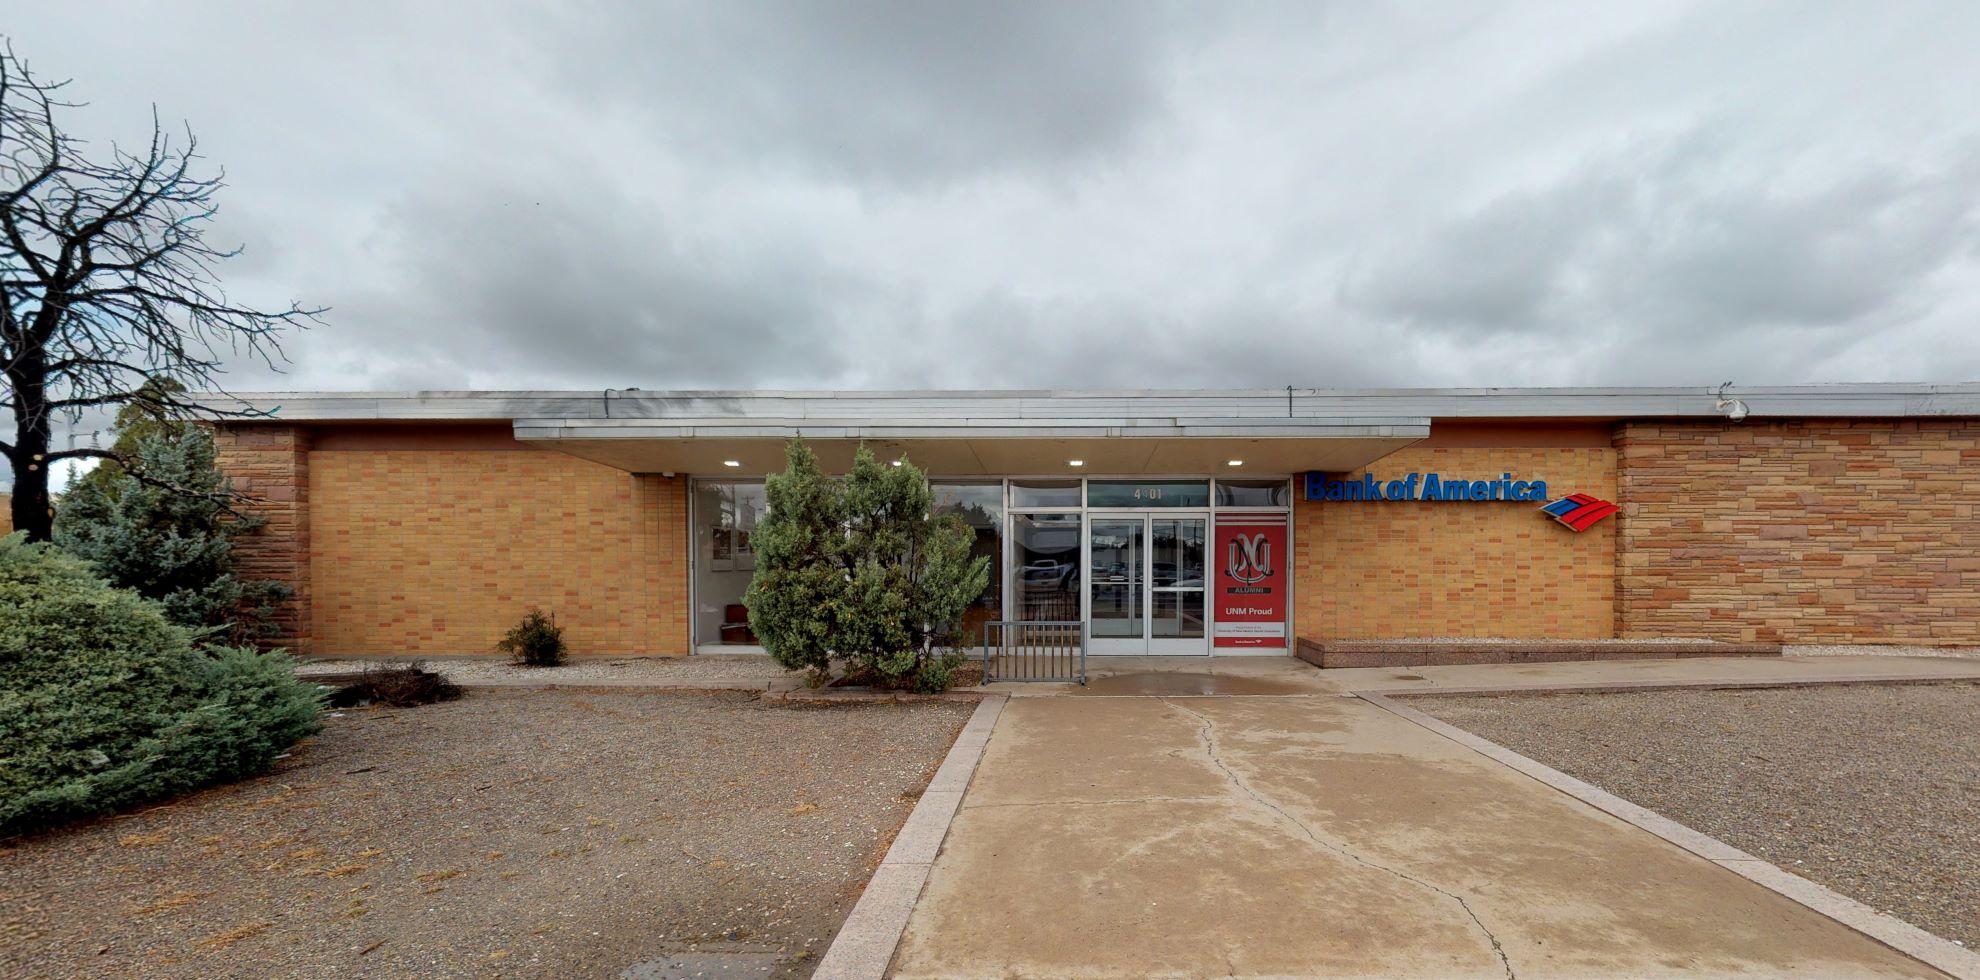 Bank of America financial center with drive-thru ATM   4401 Central Ave NE, Albuquerque, NM 87108